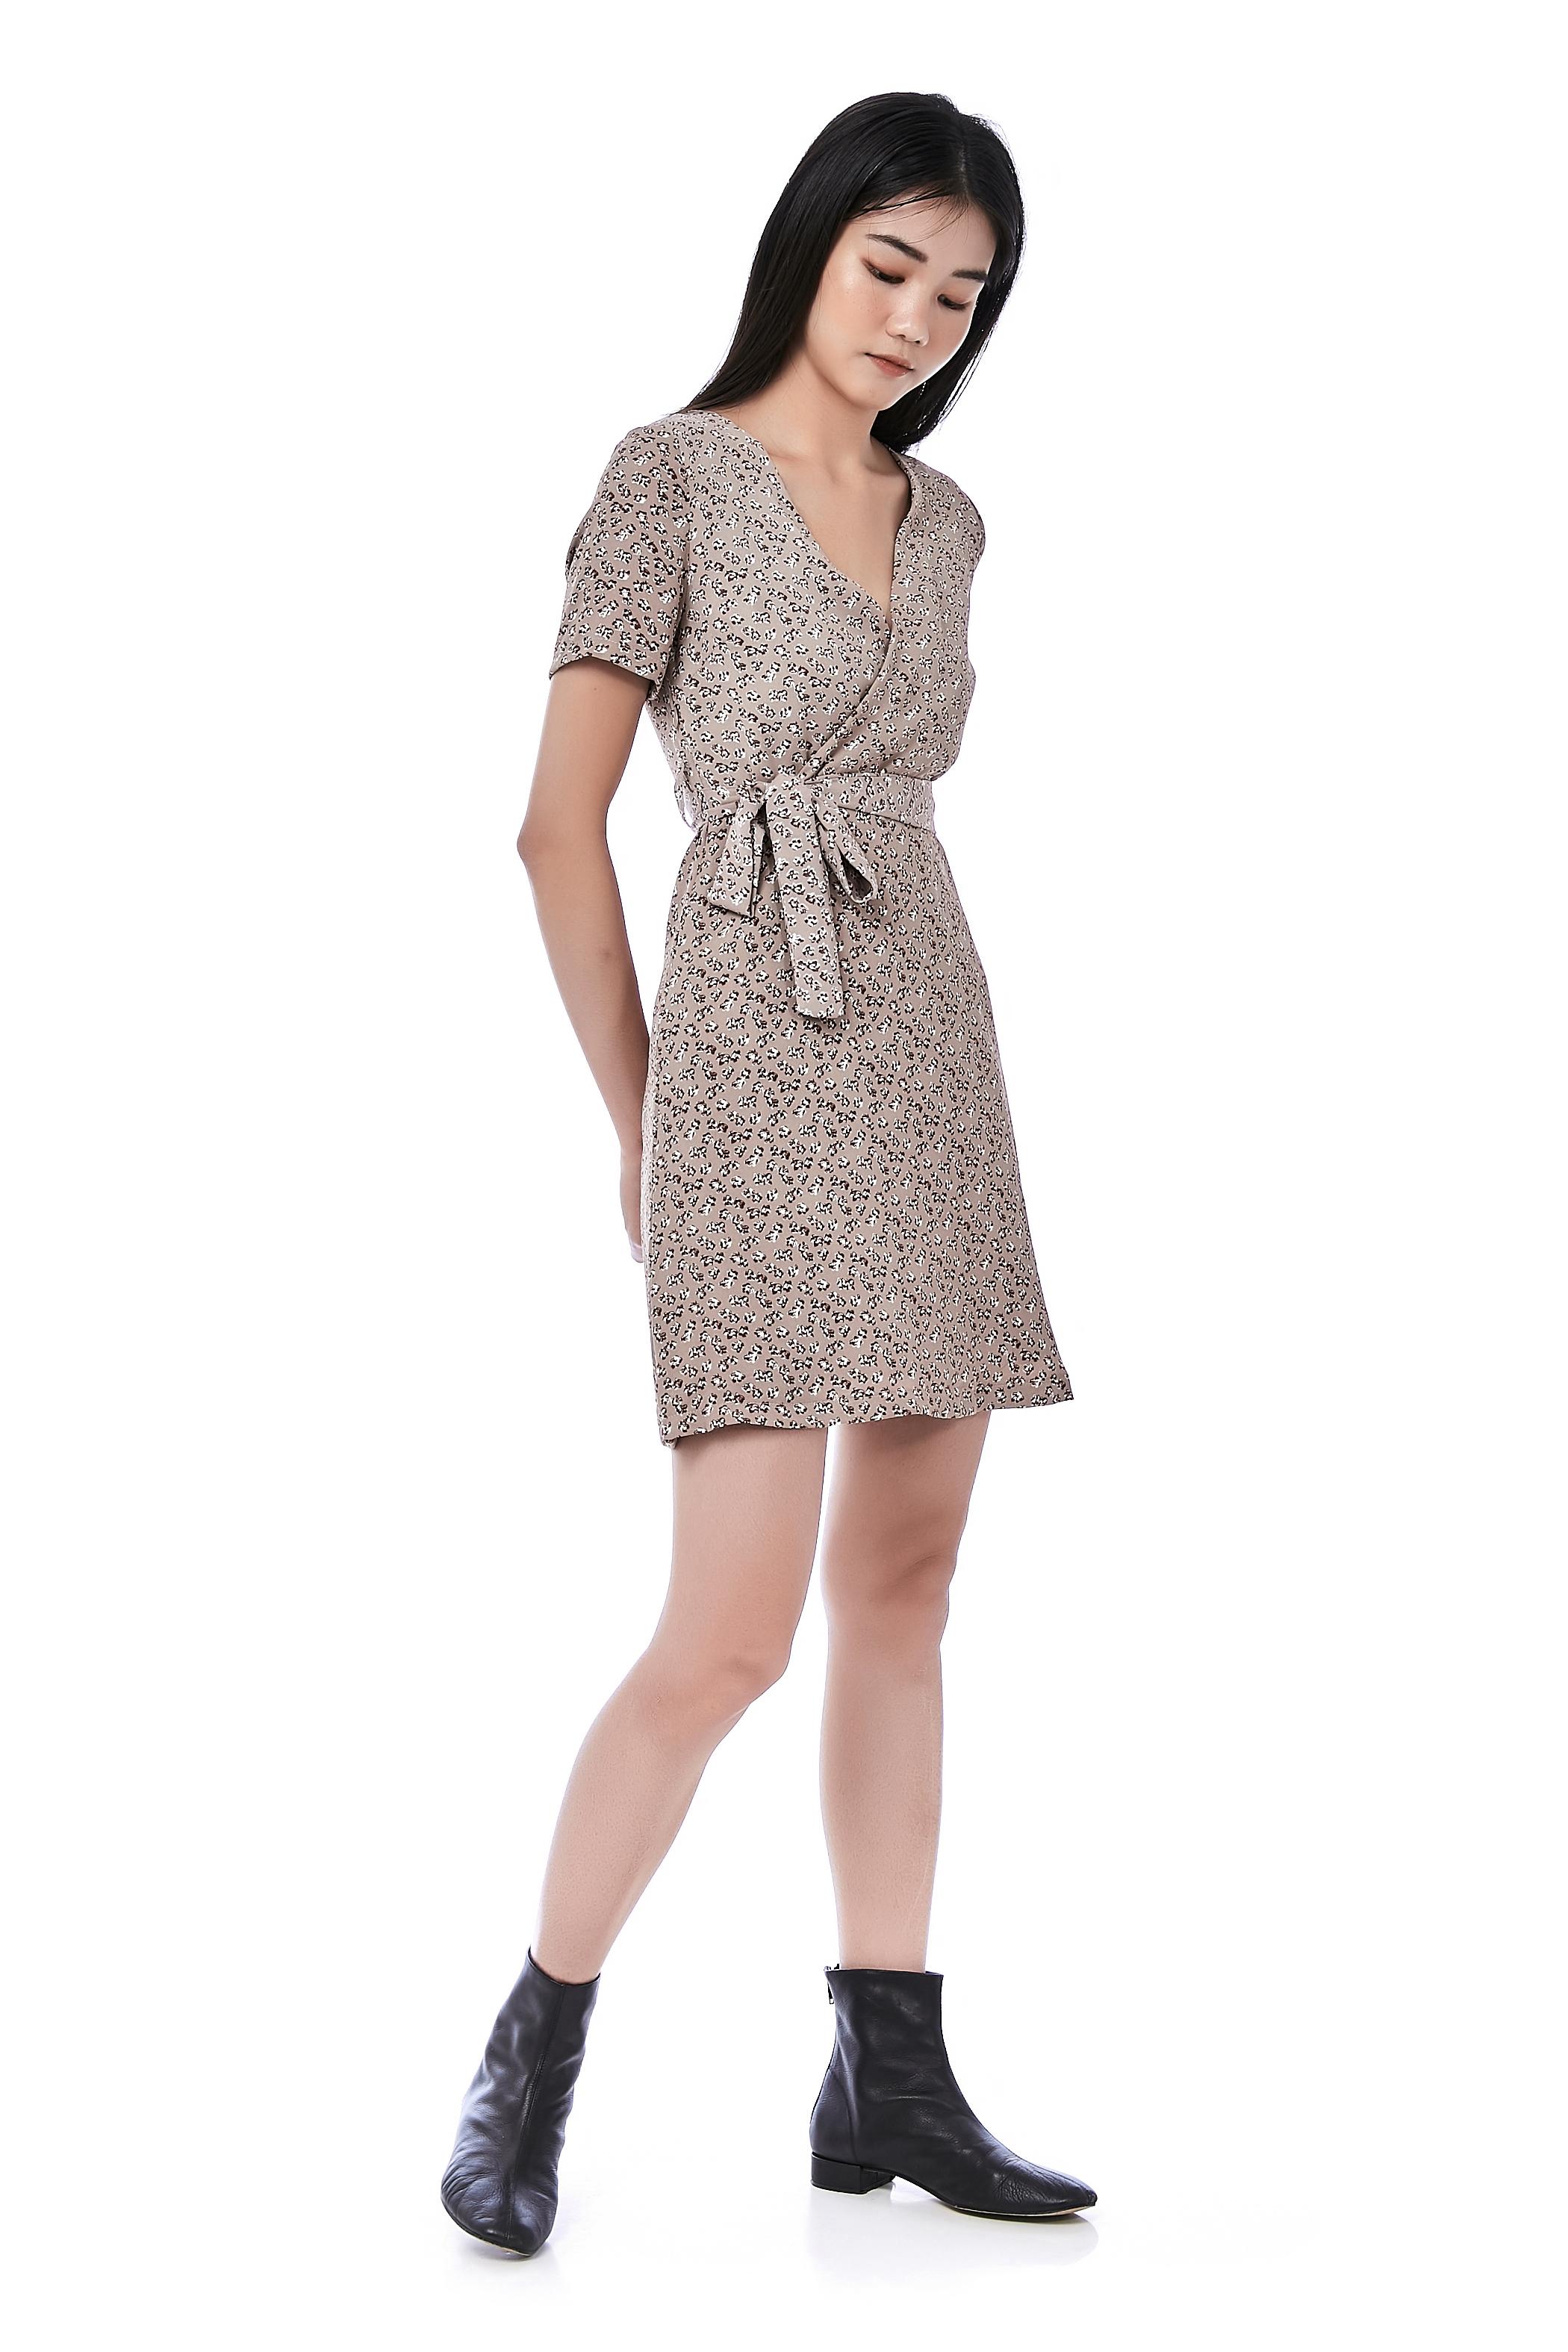 Regine Cross-Front Dress